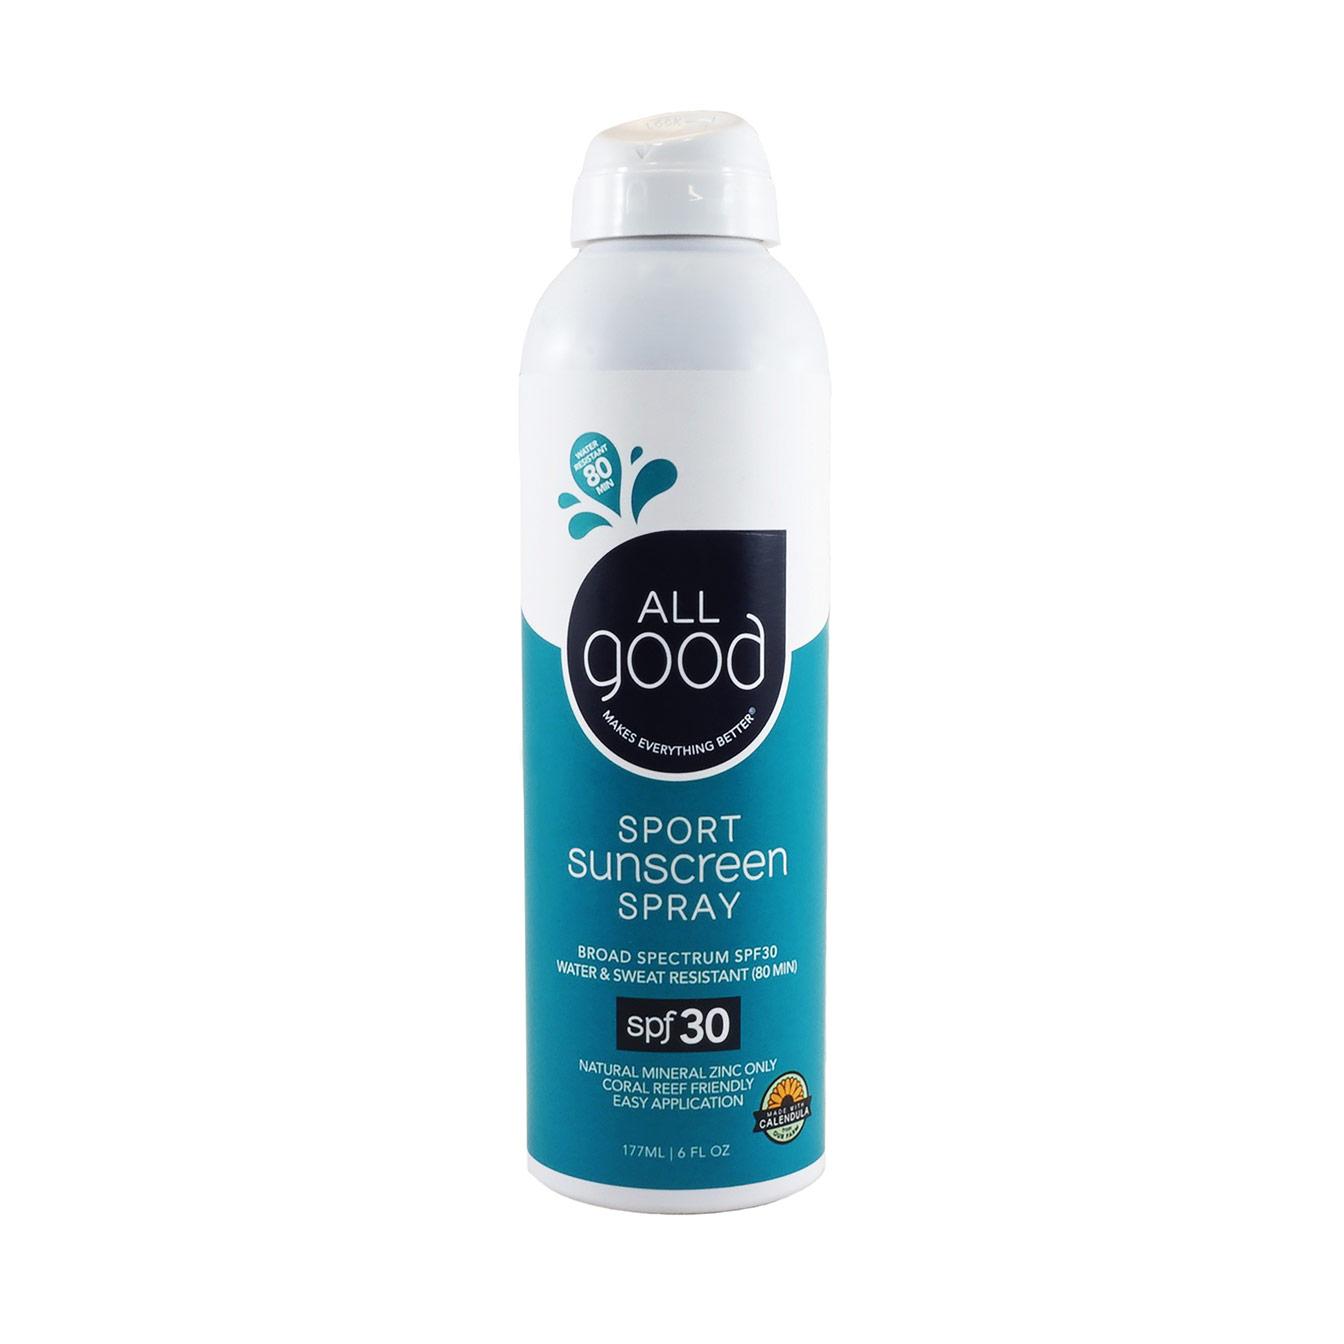 SPF30 Sport Sunscreen Spray